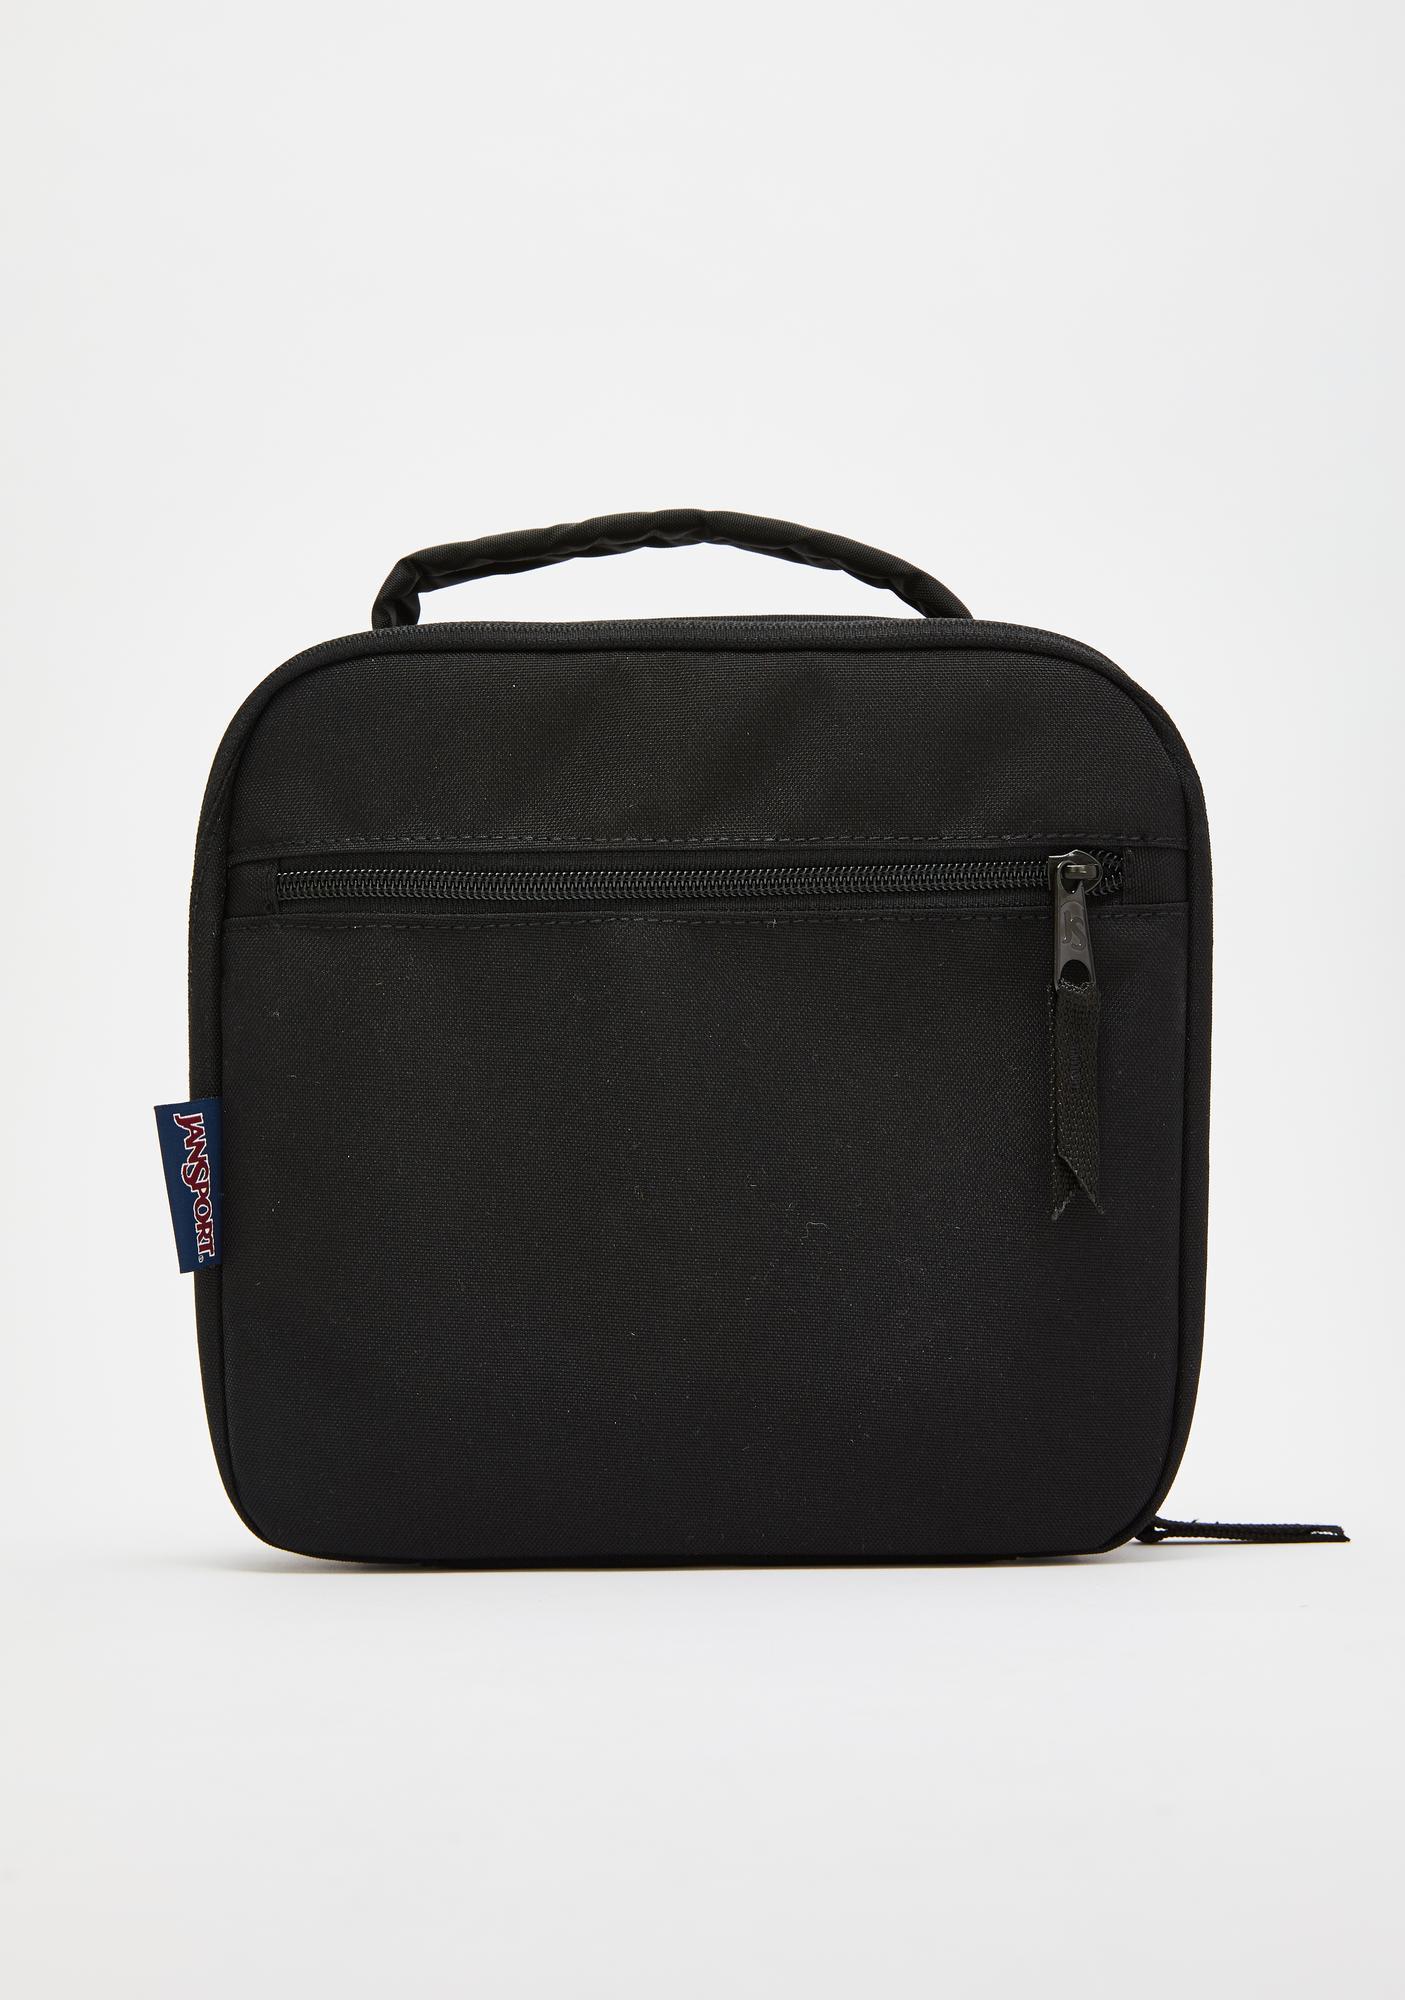 75bbc1b68705 Lunch Break Insulated Bag